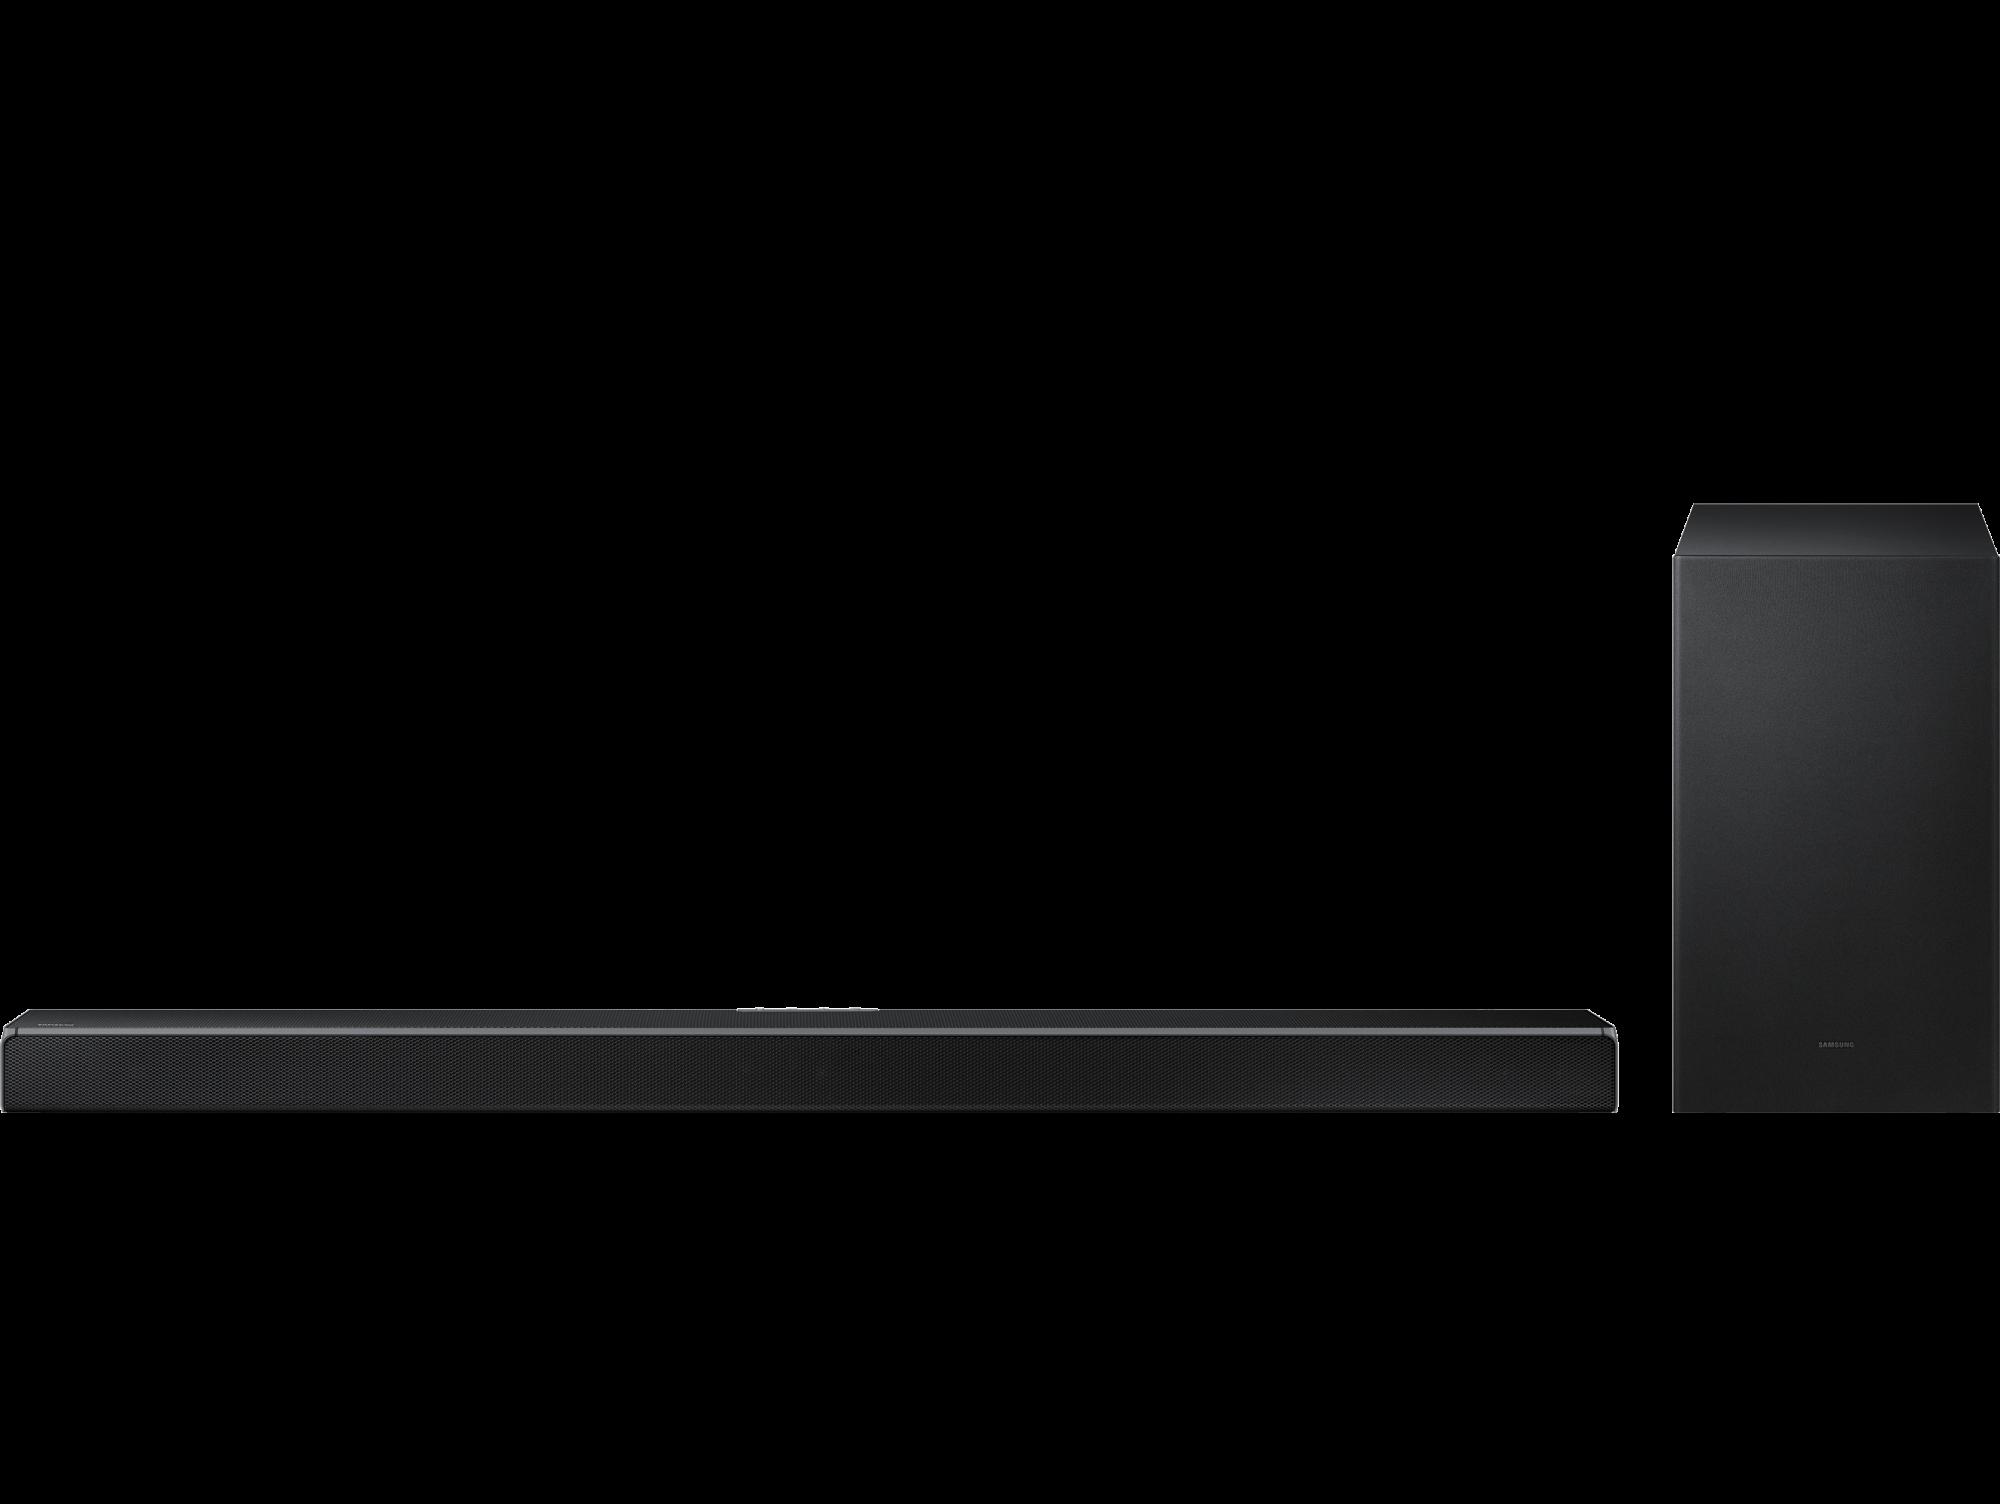 HW-Q600A 3.1.2ch Samsung Q-Symphony Cinematic Dolby Atmos Q-Series Sound...